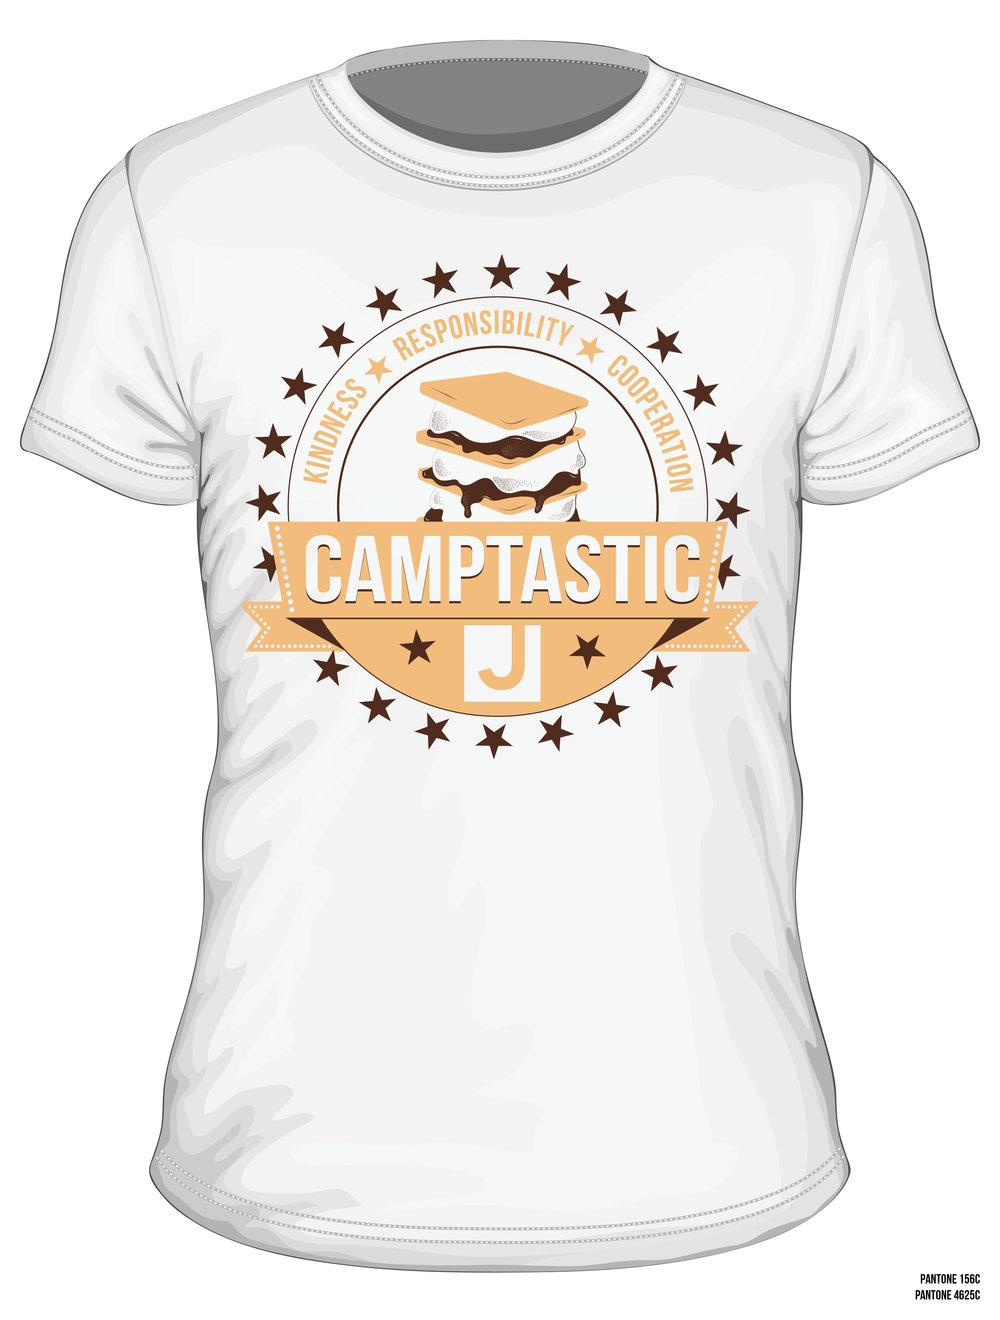 a57812fdd48a-Camptastic_T_shirt_Mockup.jpg